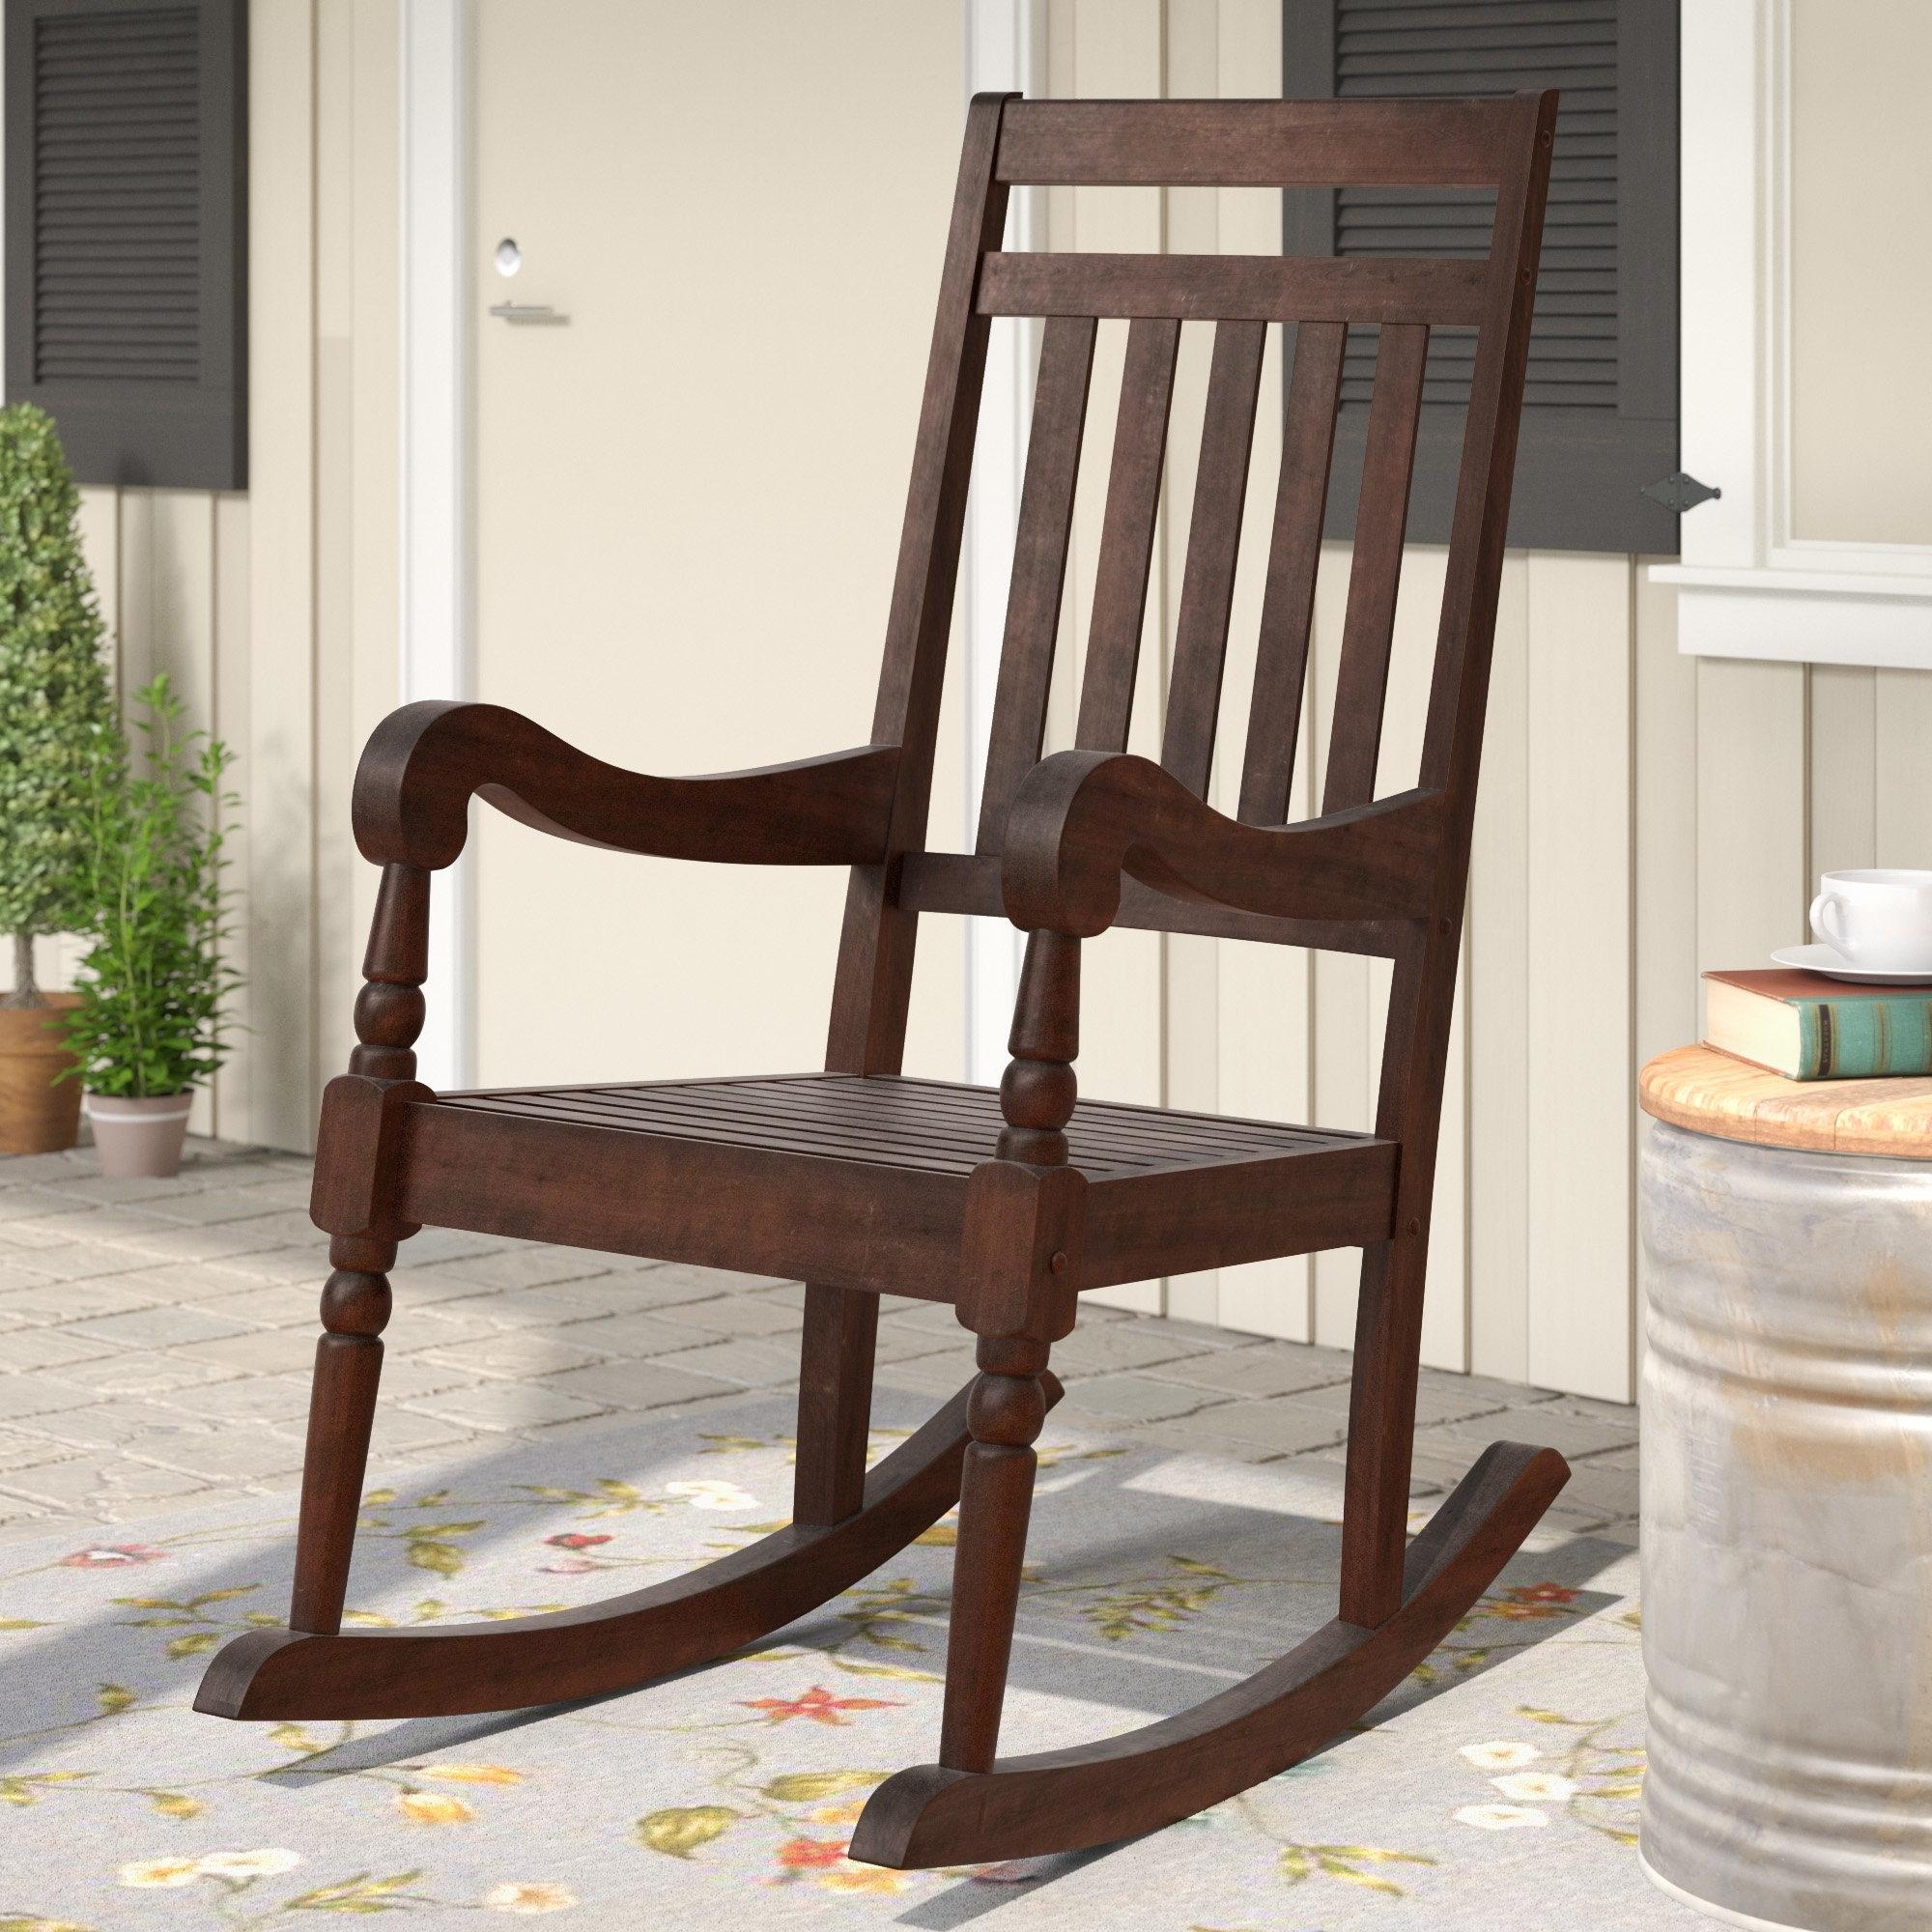 Most Recent Rocking Chairs At Wayfair Throughout Laurel Foundry Modern Farmhouse Glen Ullin Modern Rocking Chair (View 12 of 20)